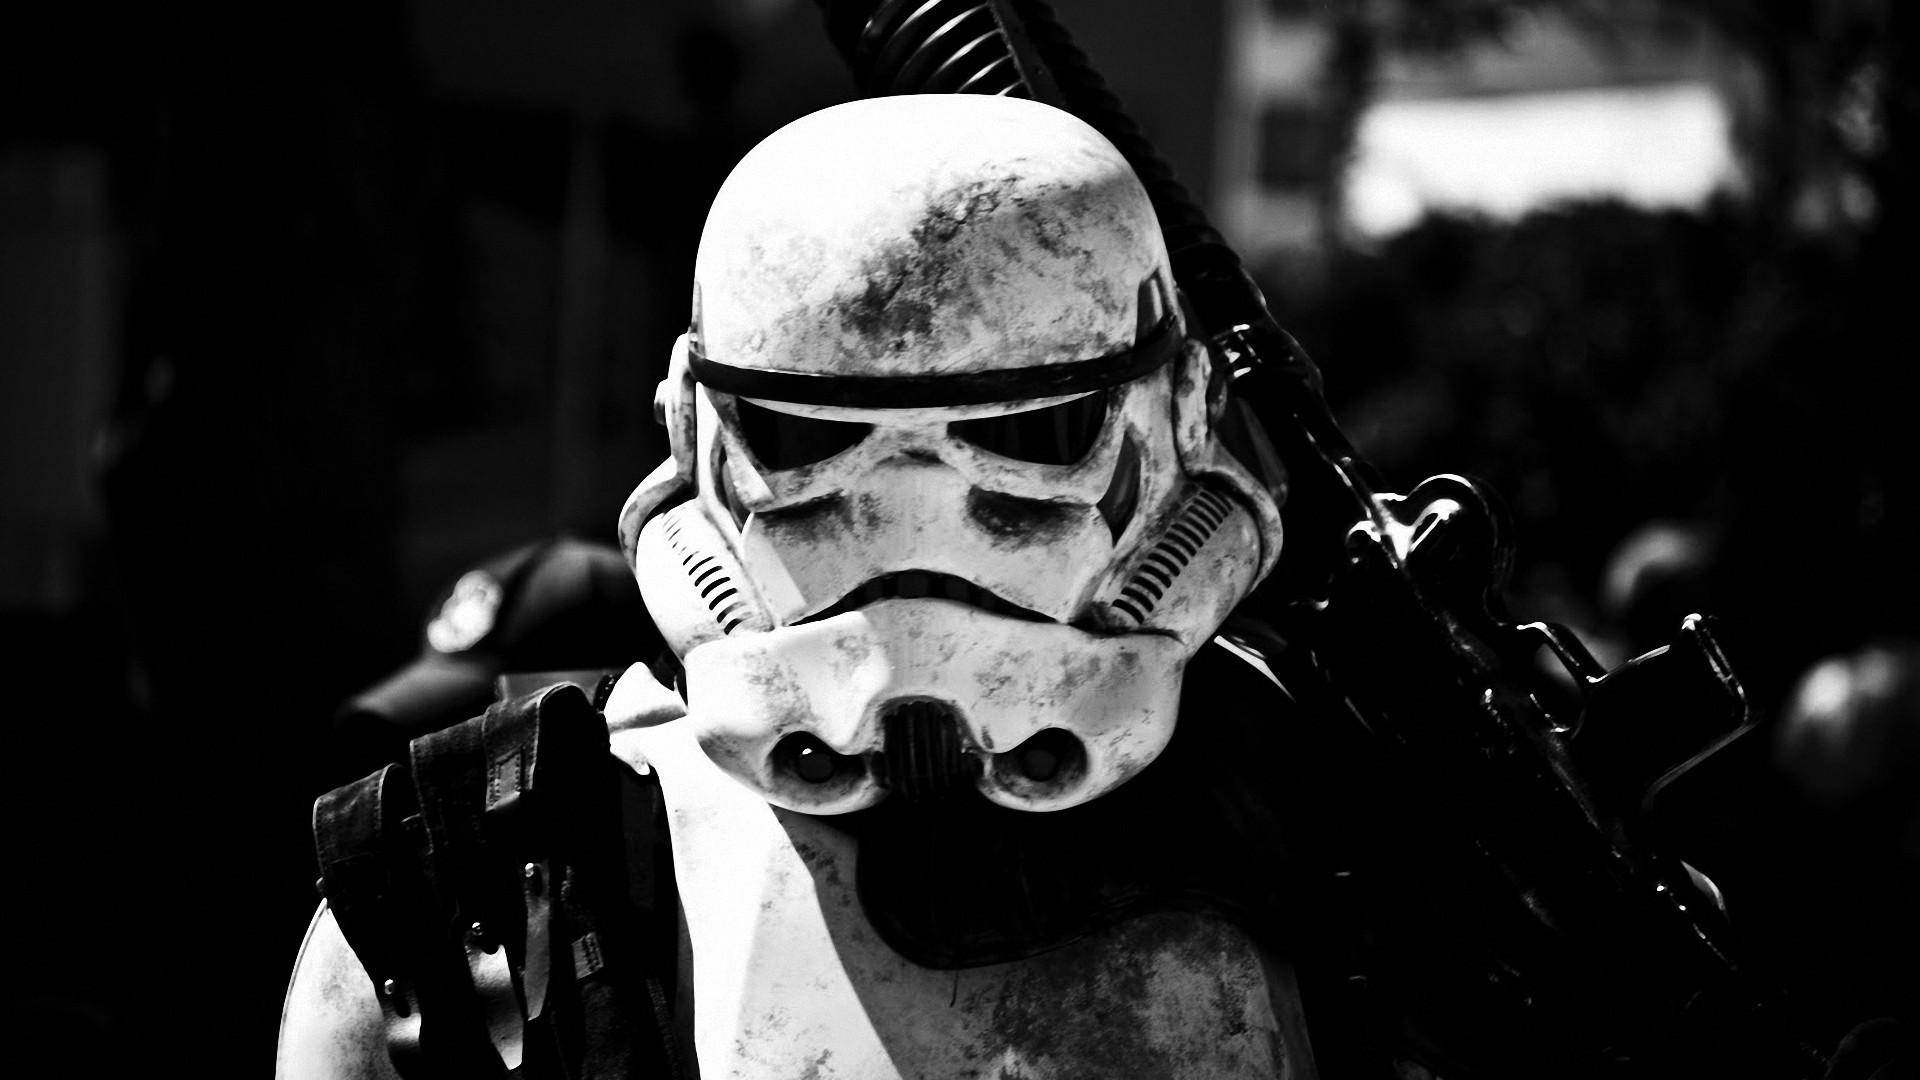 44+ Stormtrooper Wallpaper HD on WallpaperSafari